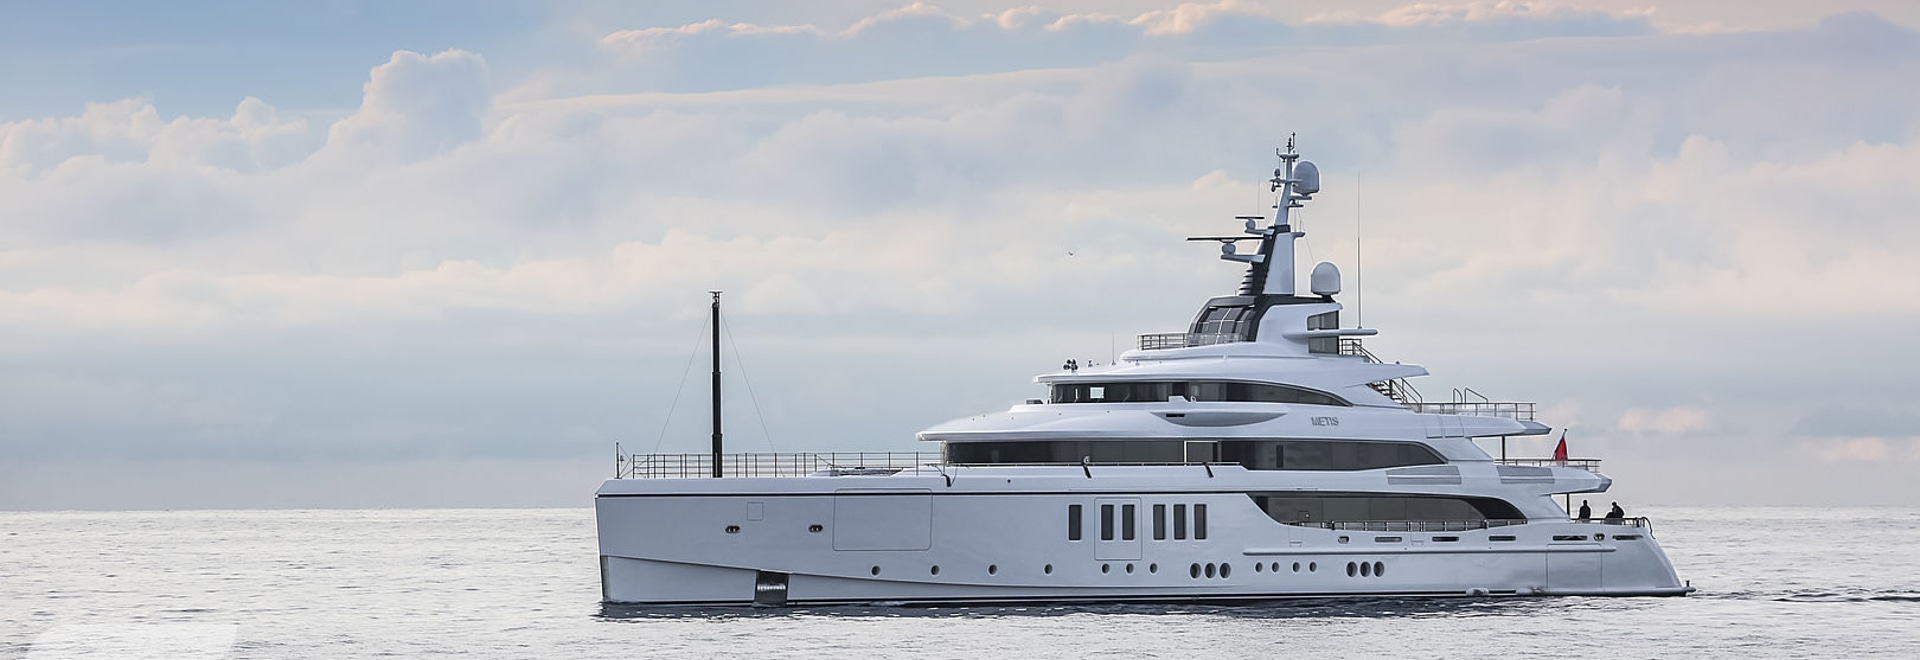 Benetti consegna 63m superyacht Metis